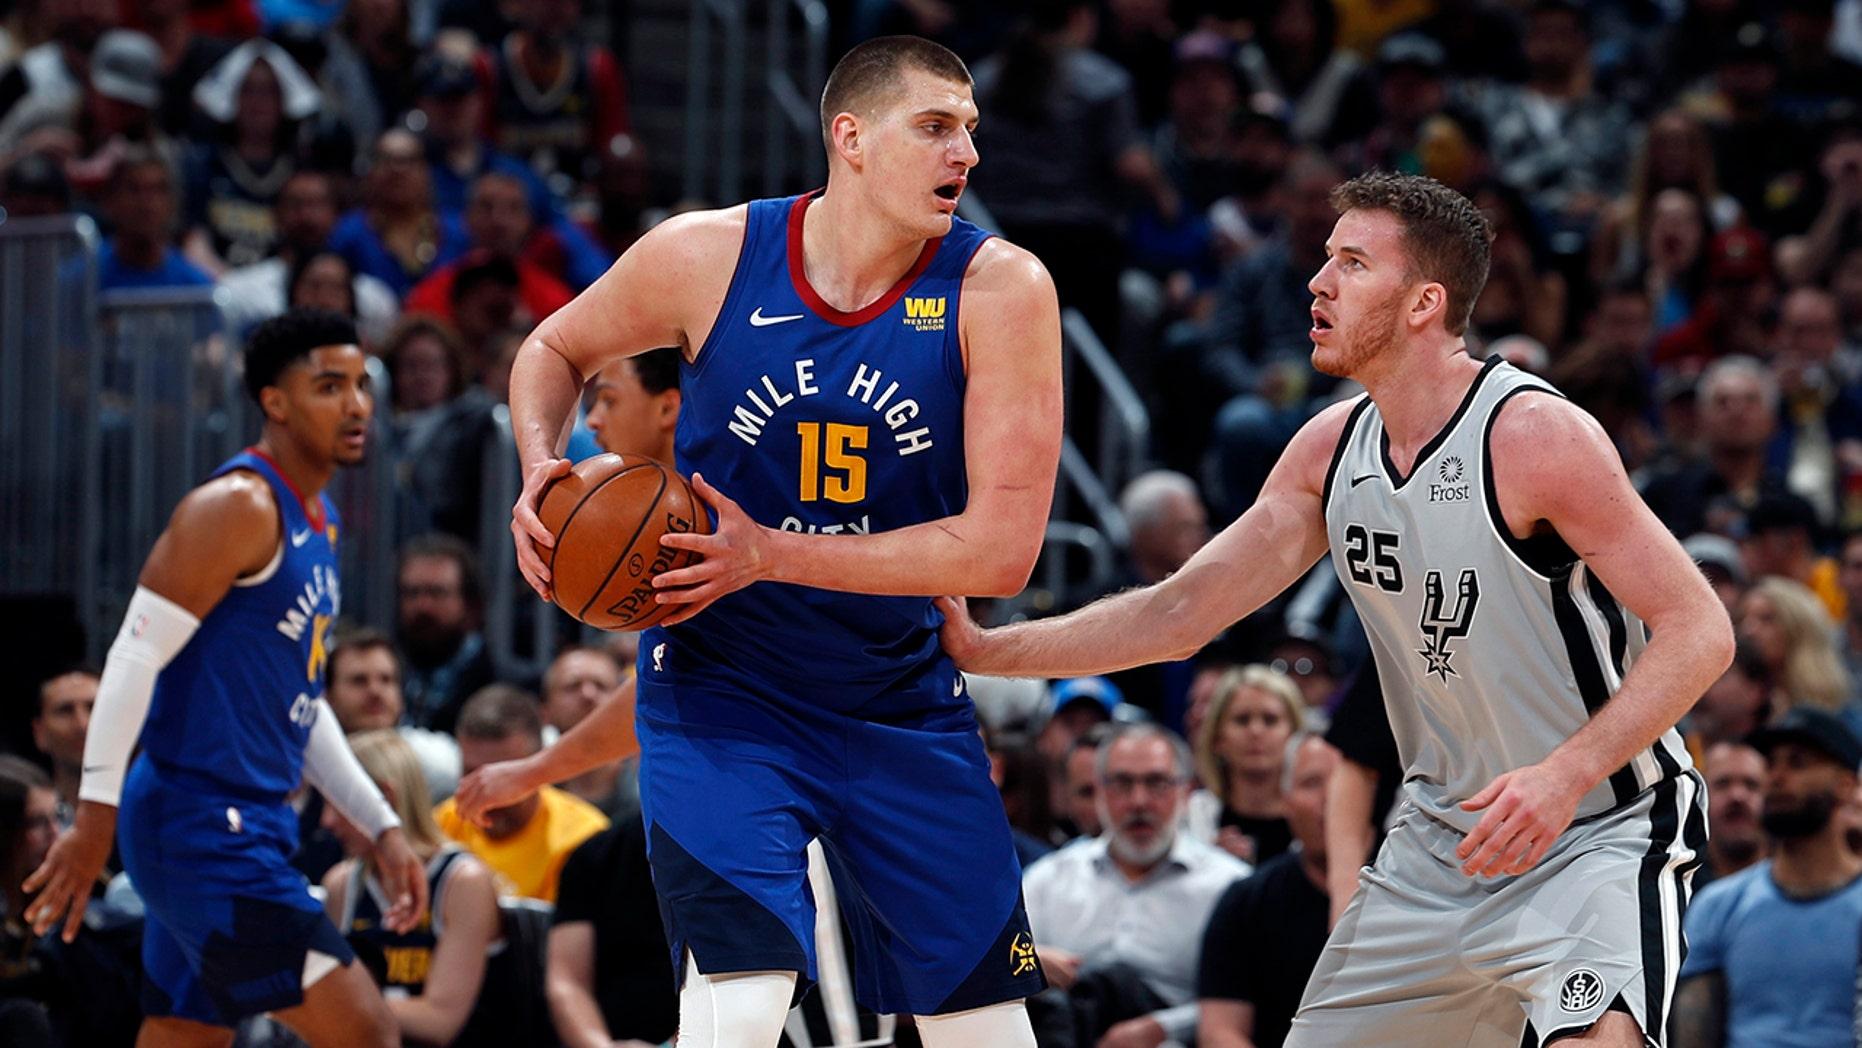 df24cd800c2 Denver Nuggets center Nikola Jokic (15) is pressured by San Antonio Spurs  center Jakob